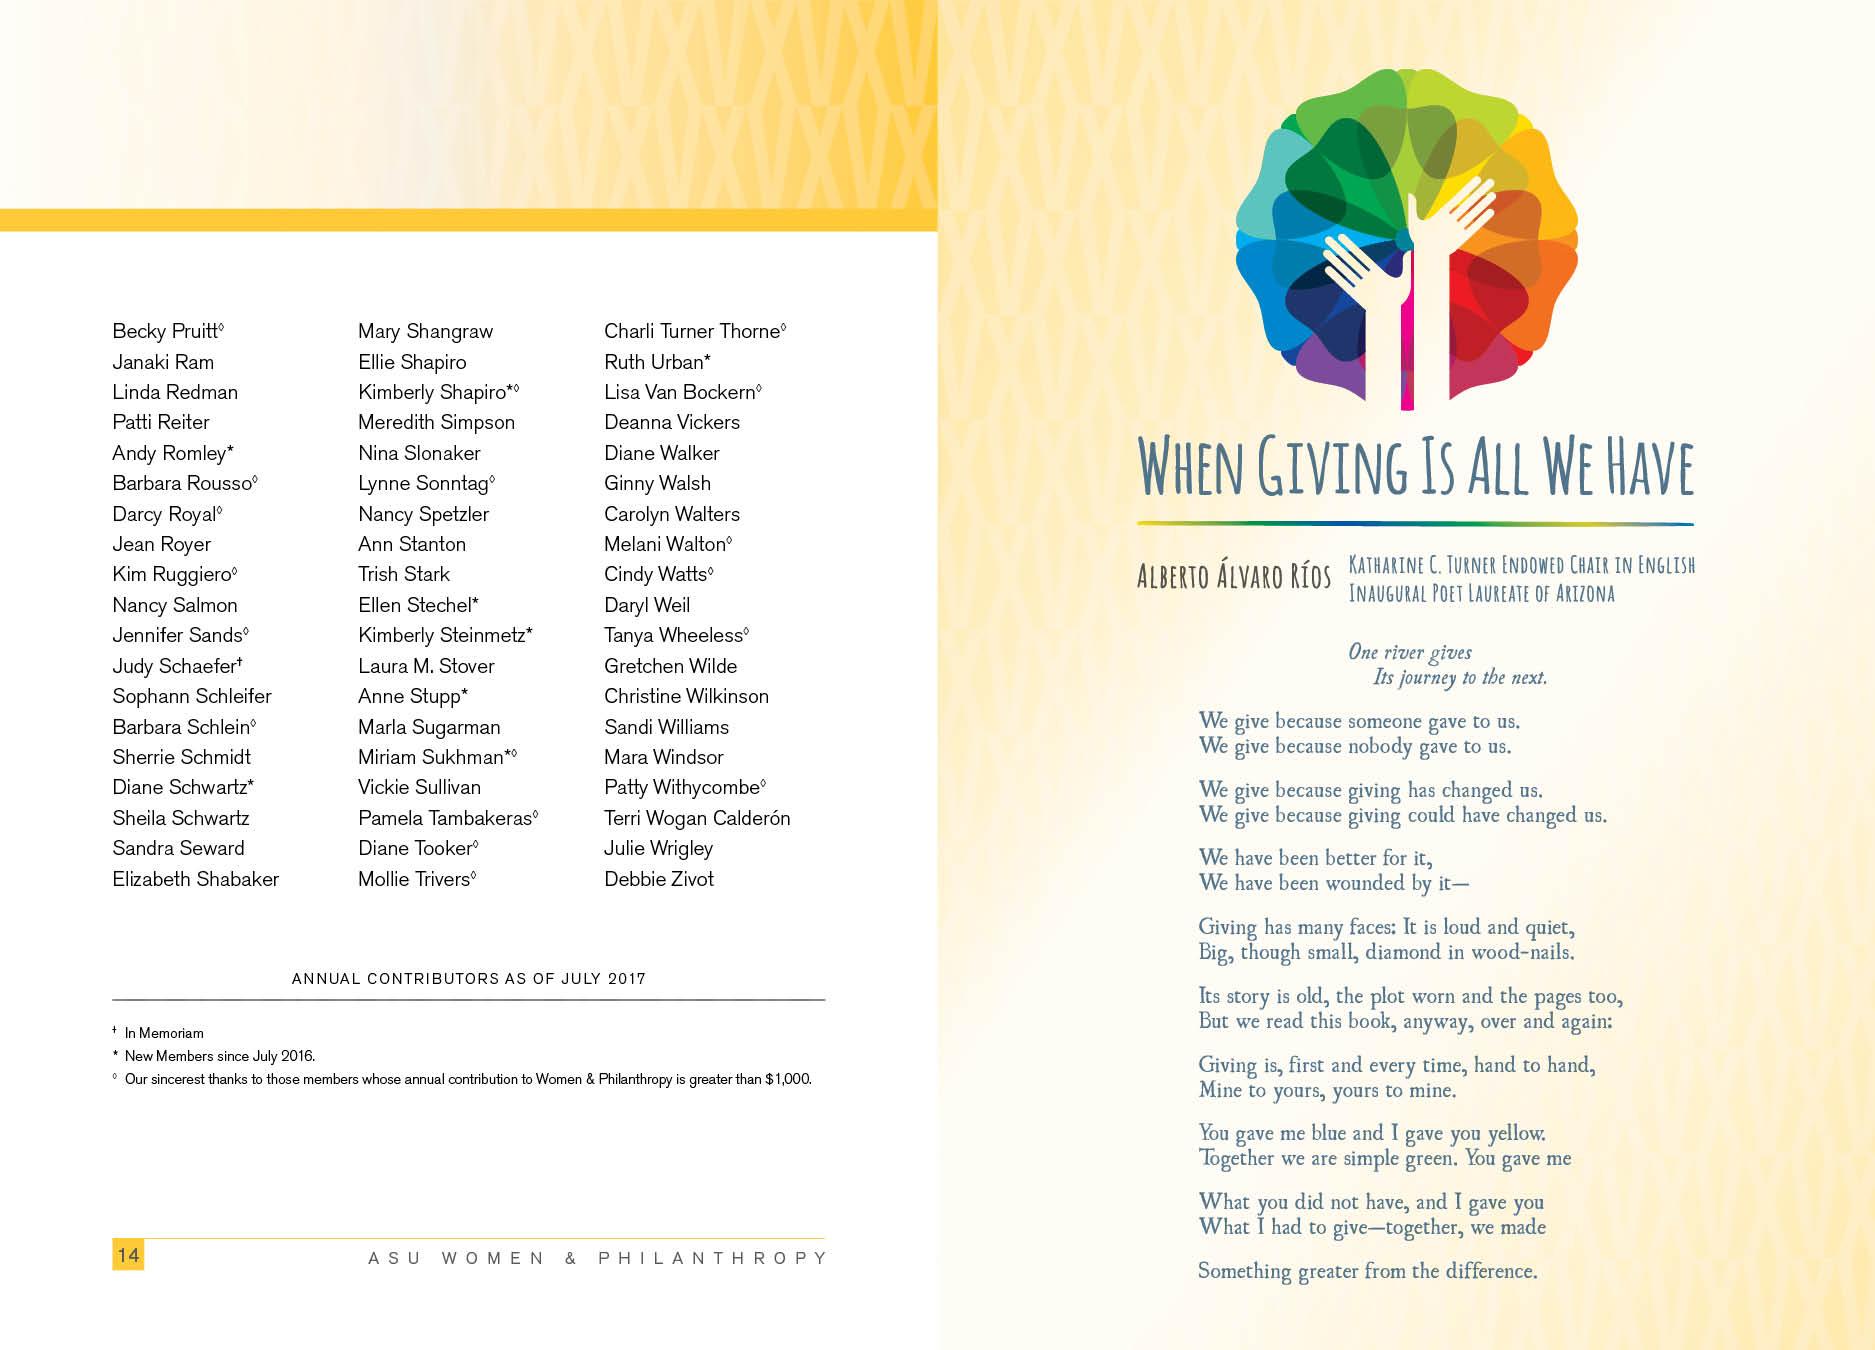 2017-ASU-Women-Philanthropy-15th-Anniversary-booklet-08